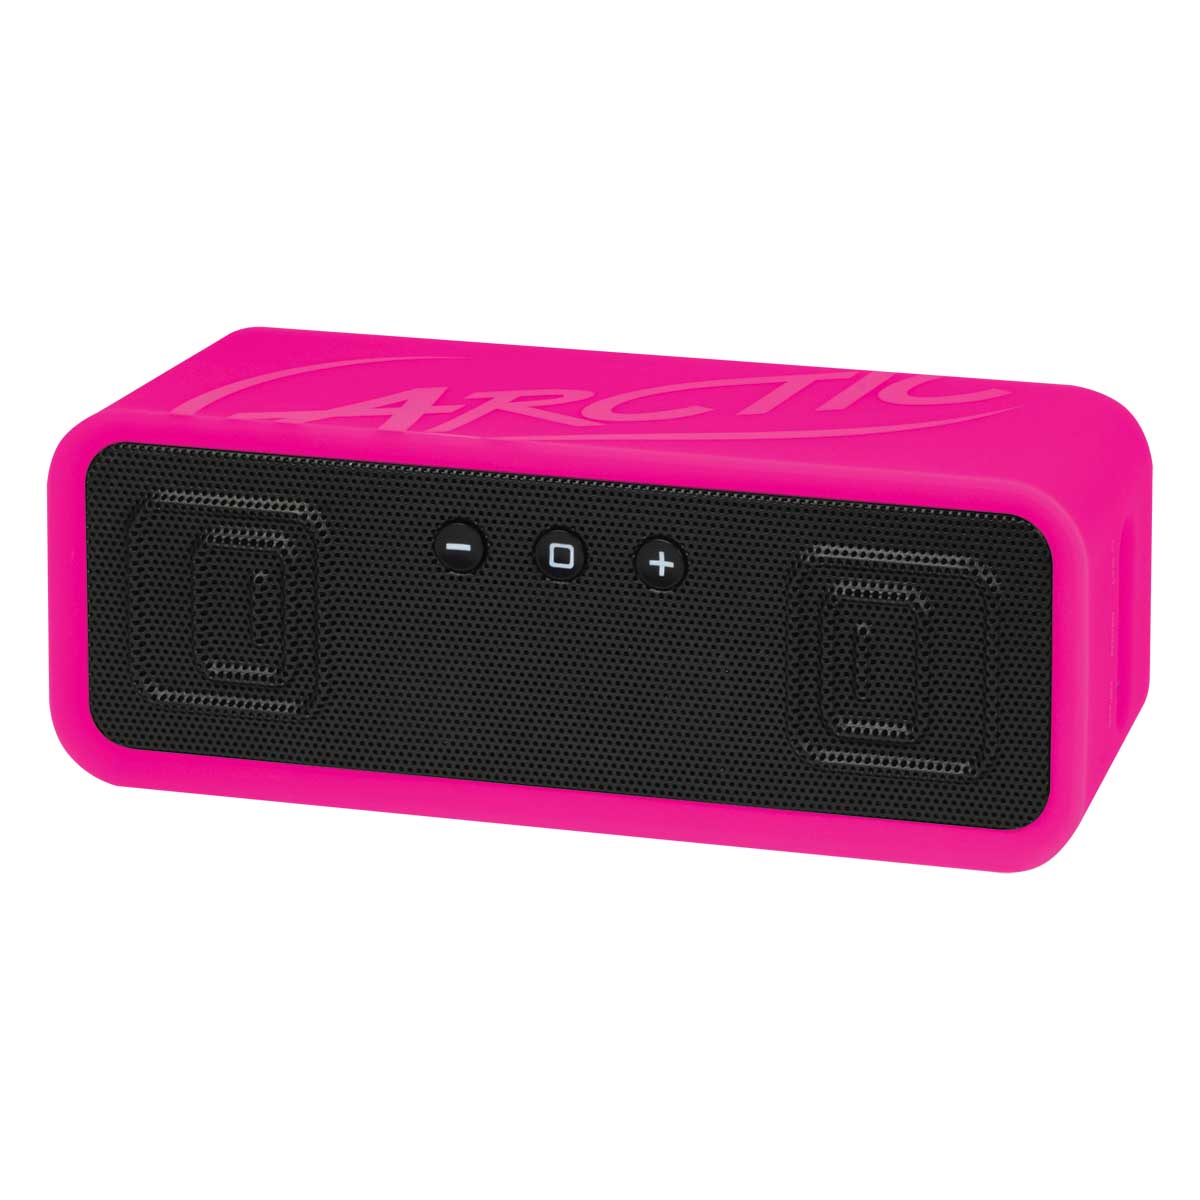 Sistem audio boxe Asus K52JT